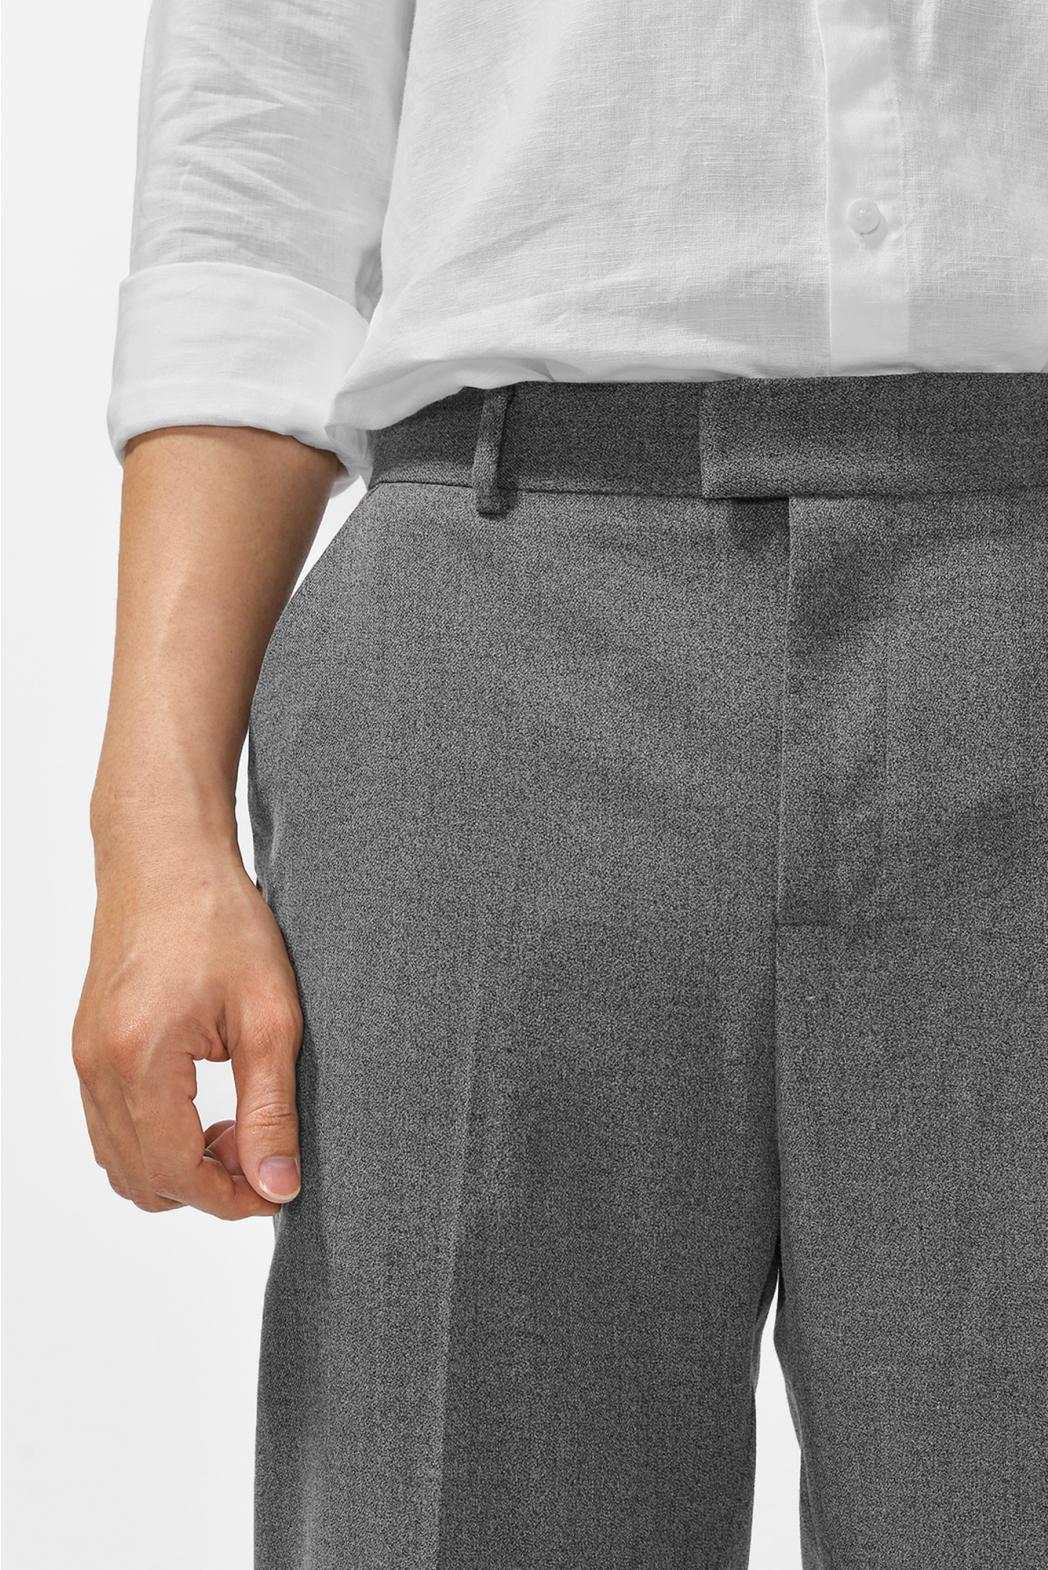 Quần vải BRUSHED FLANNEL. CARROT form - 10F20PFO013